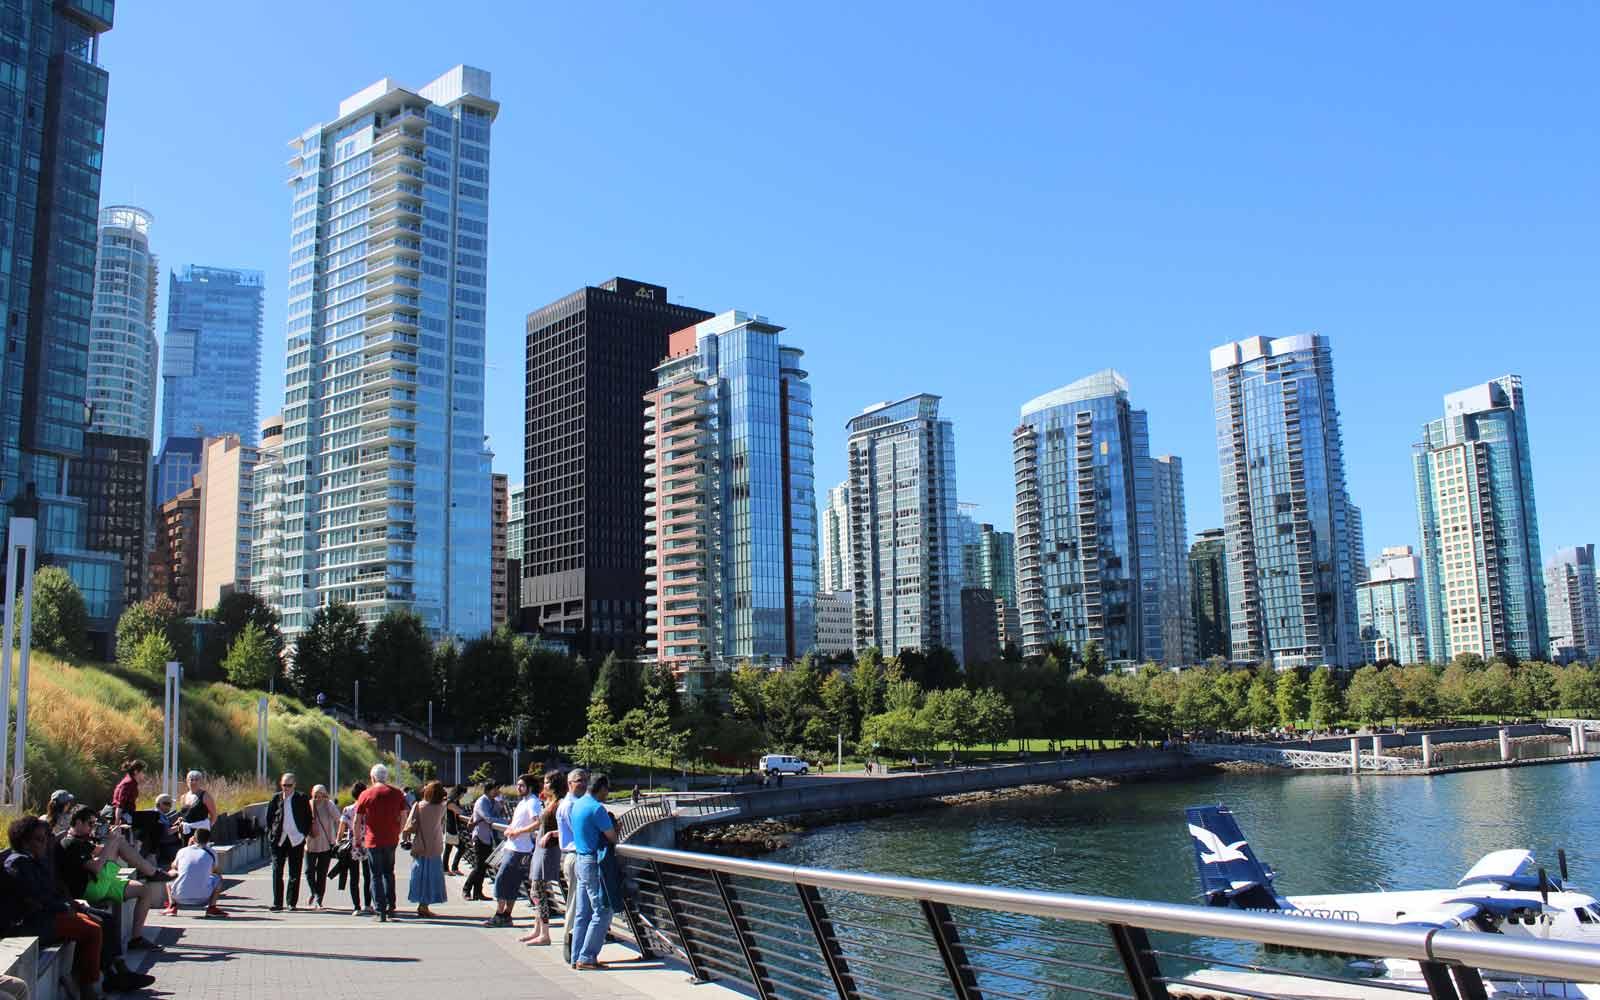 Vancouver (Skyline)